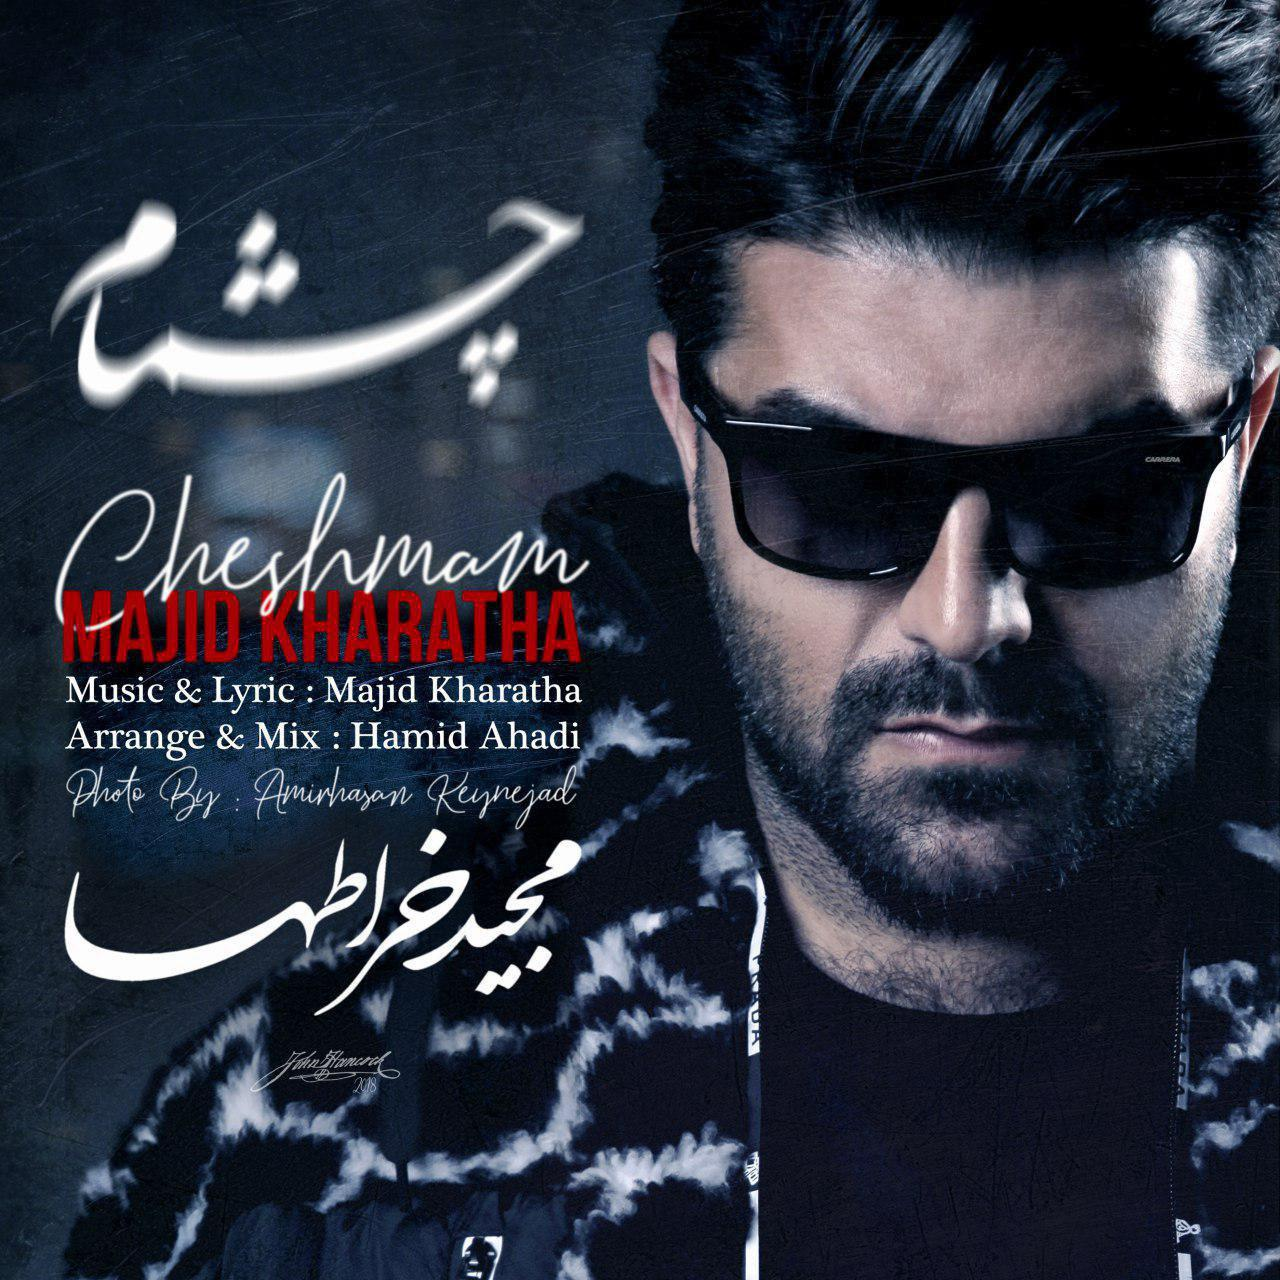 Majid Kharatha – Cheshmam